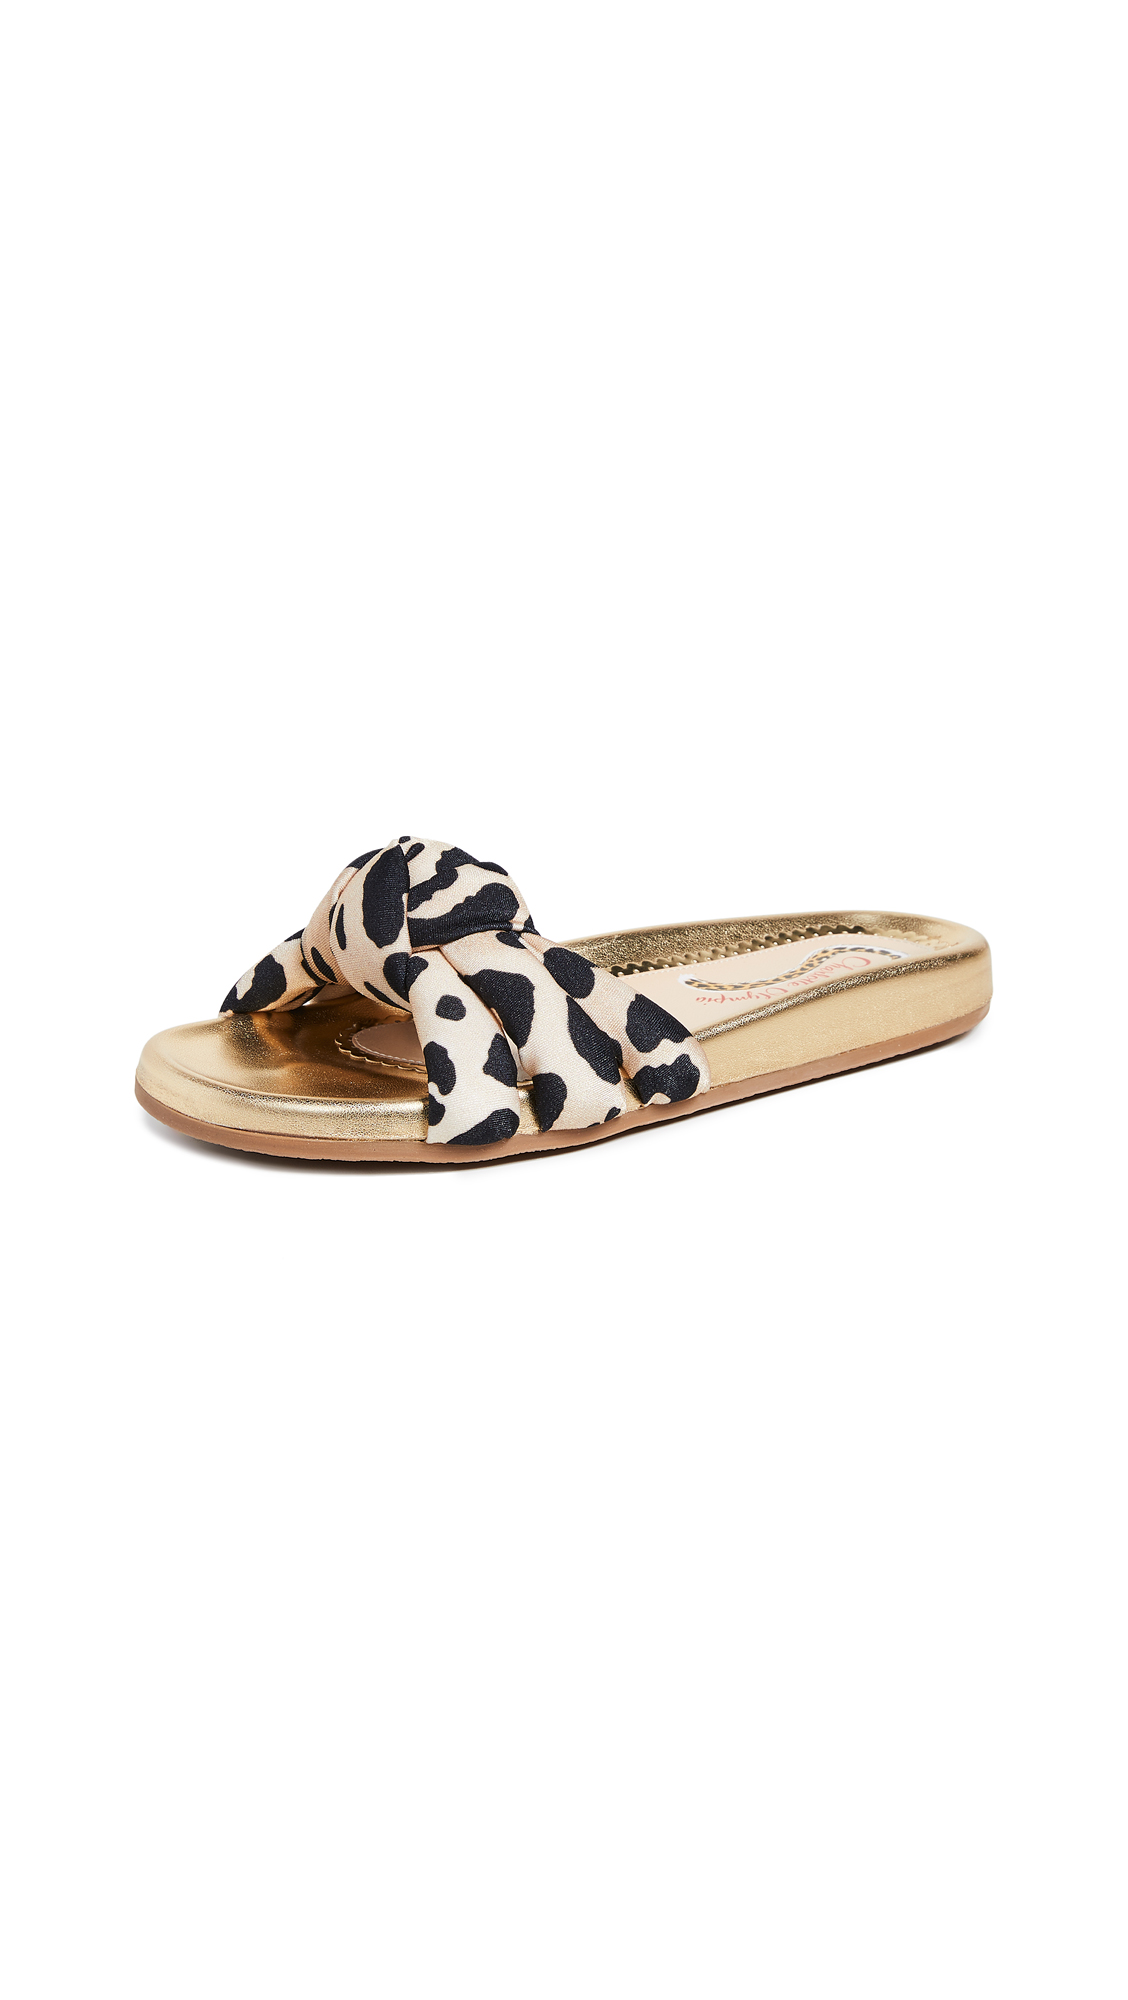 Charlotte Olympia Dylan Slide Sandals - Leopard